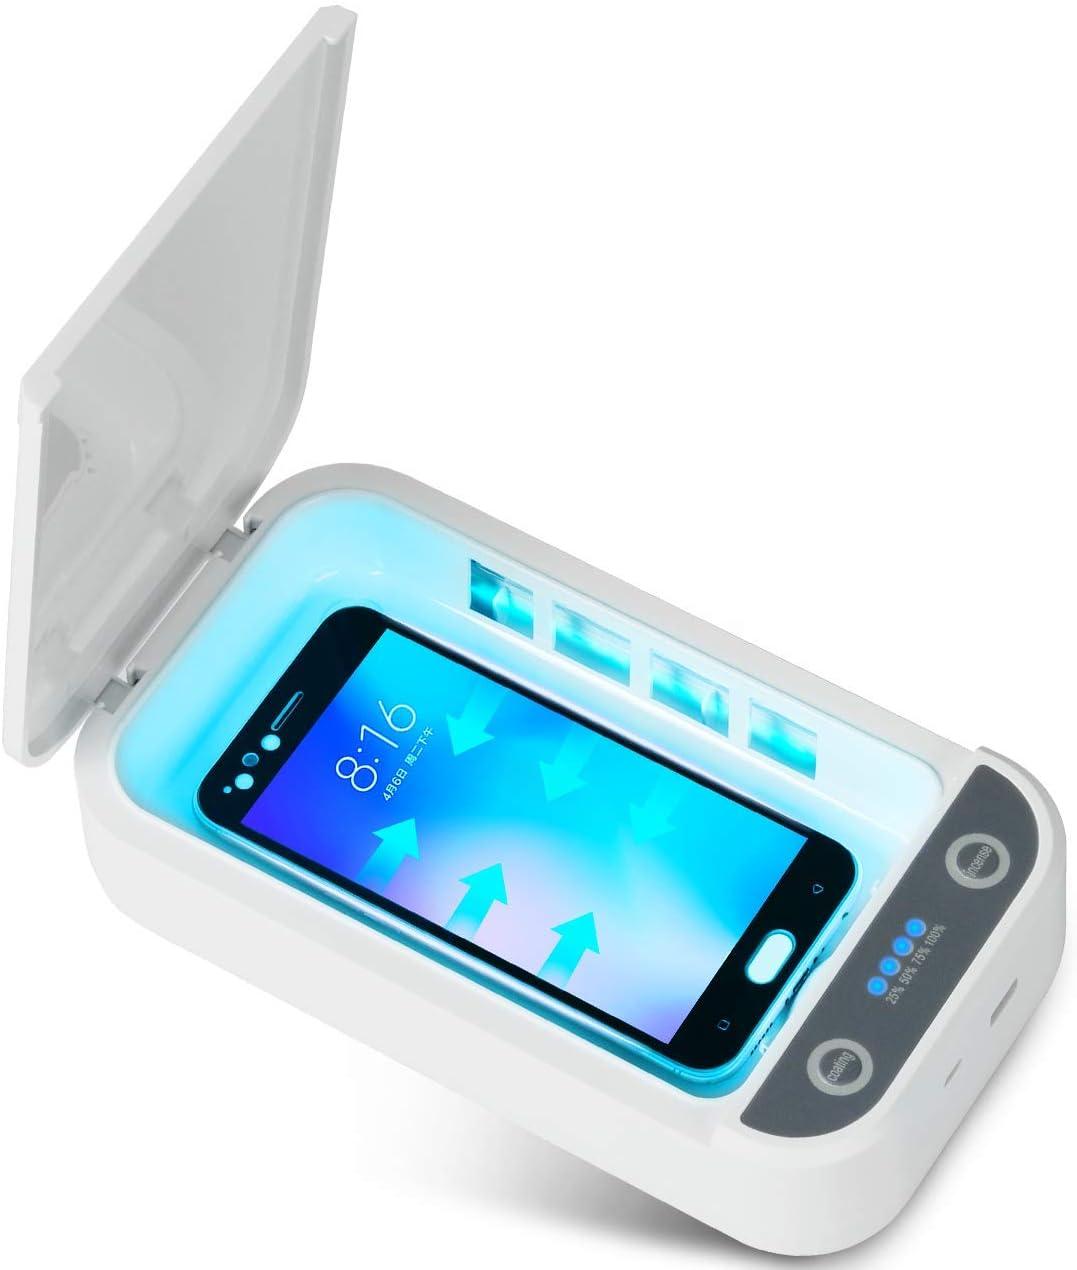 UV Phone Sterilizer Box Portable with C USB Many popular Cheap sale brands Light